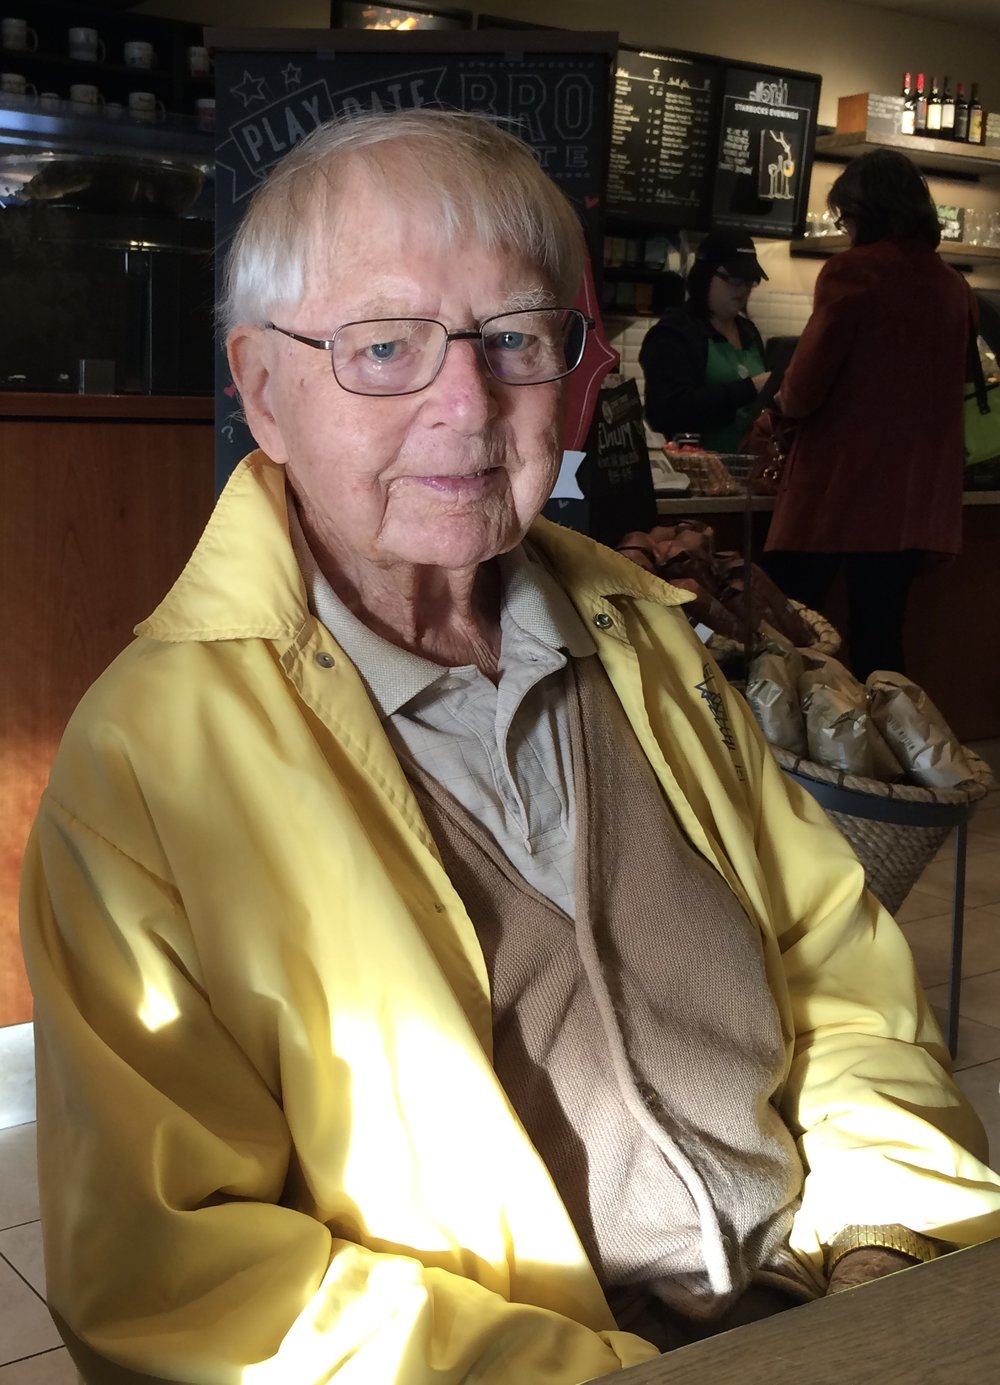 My Grandad circa 2014